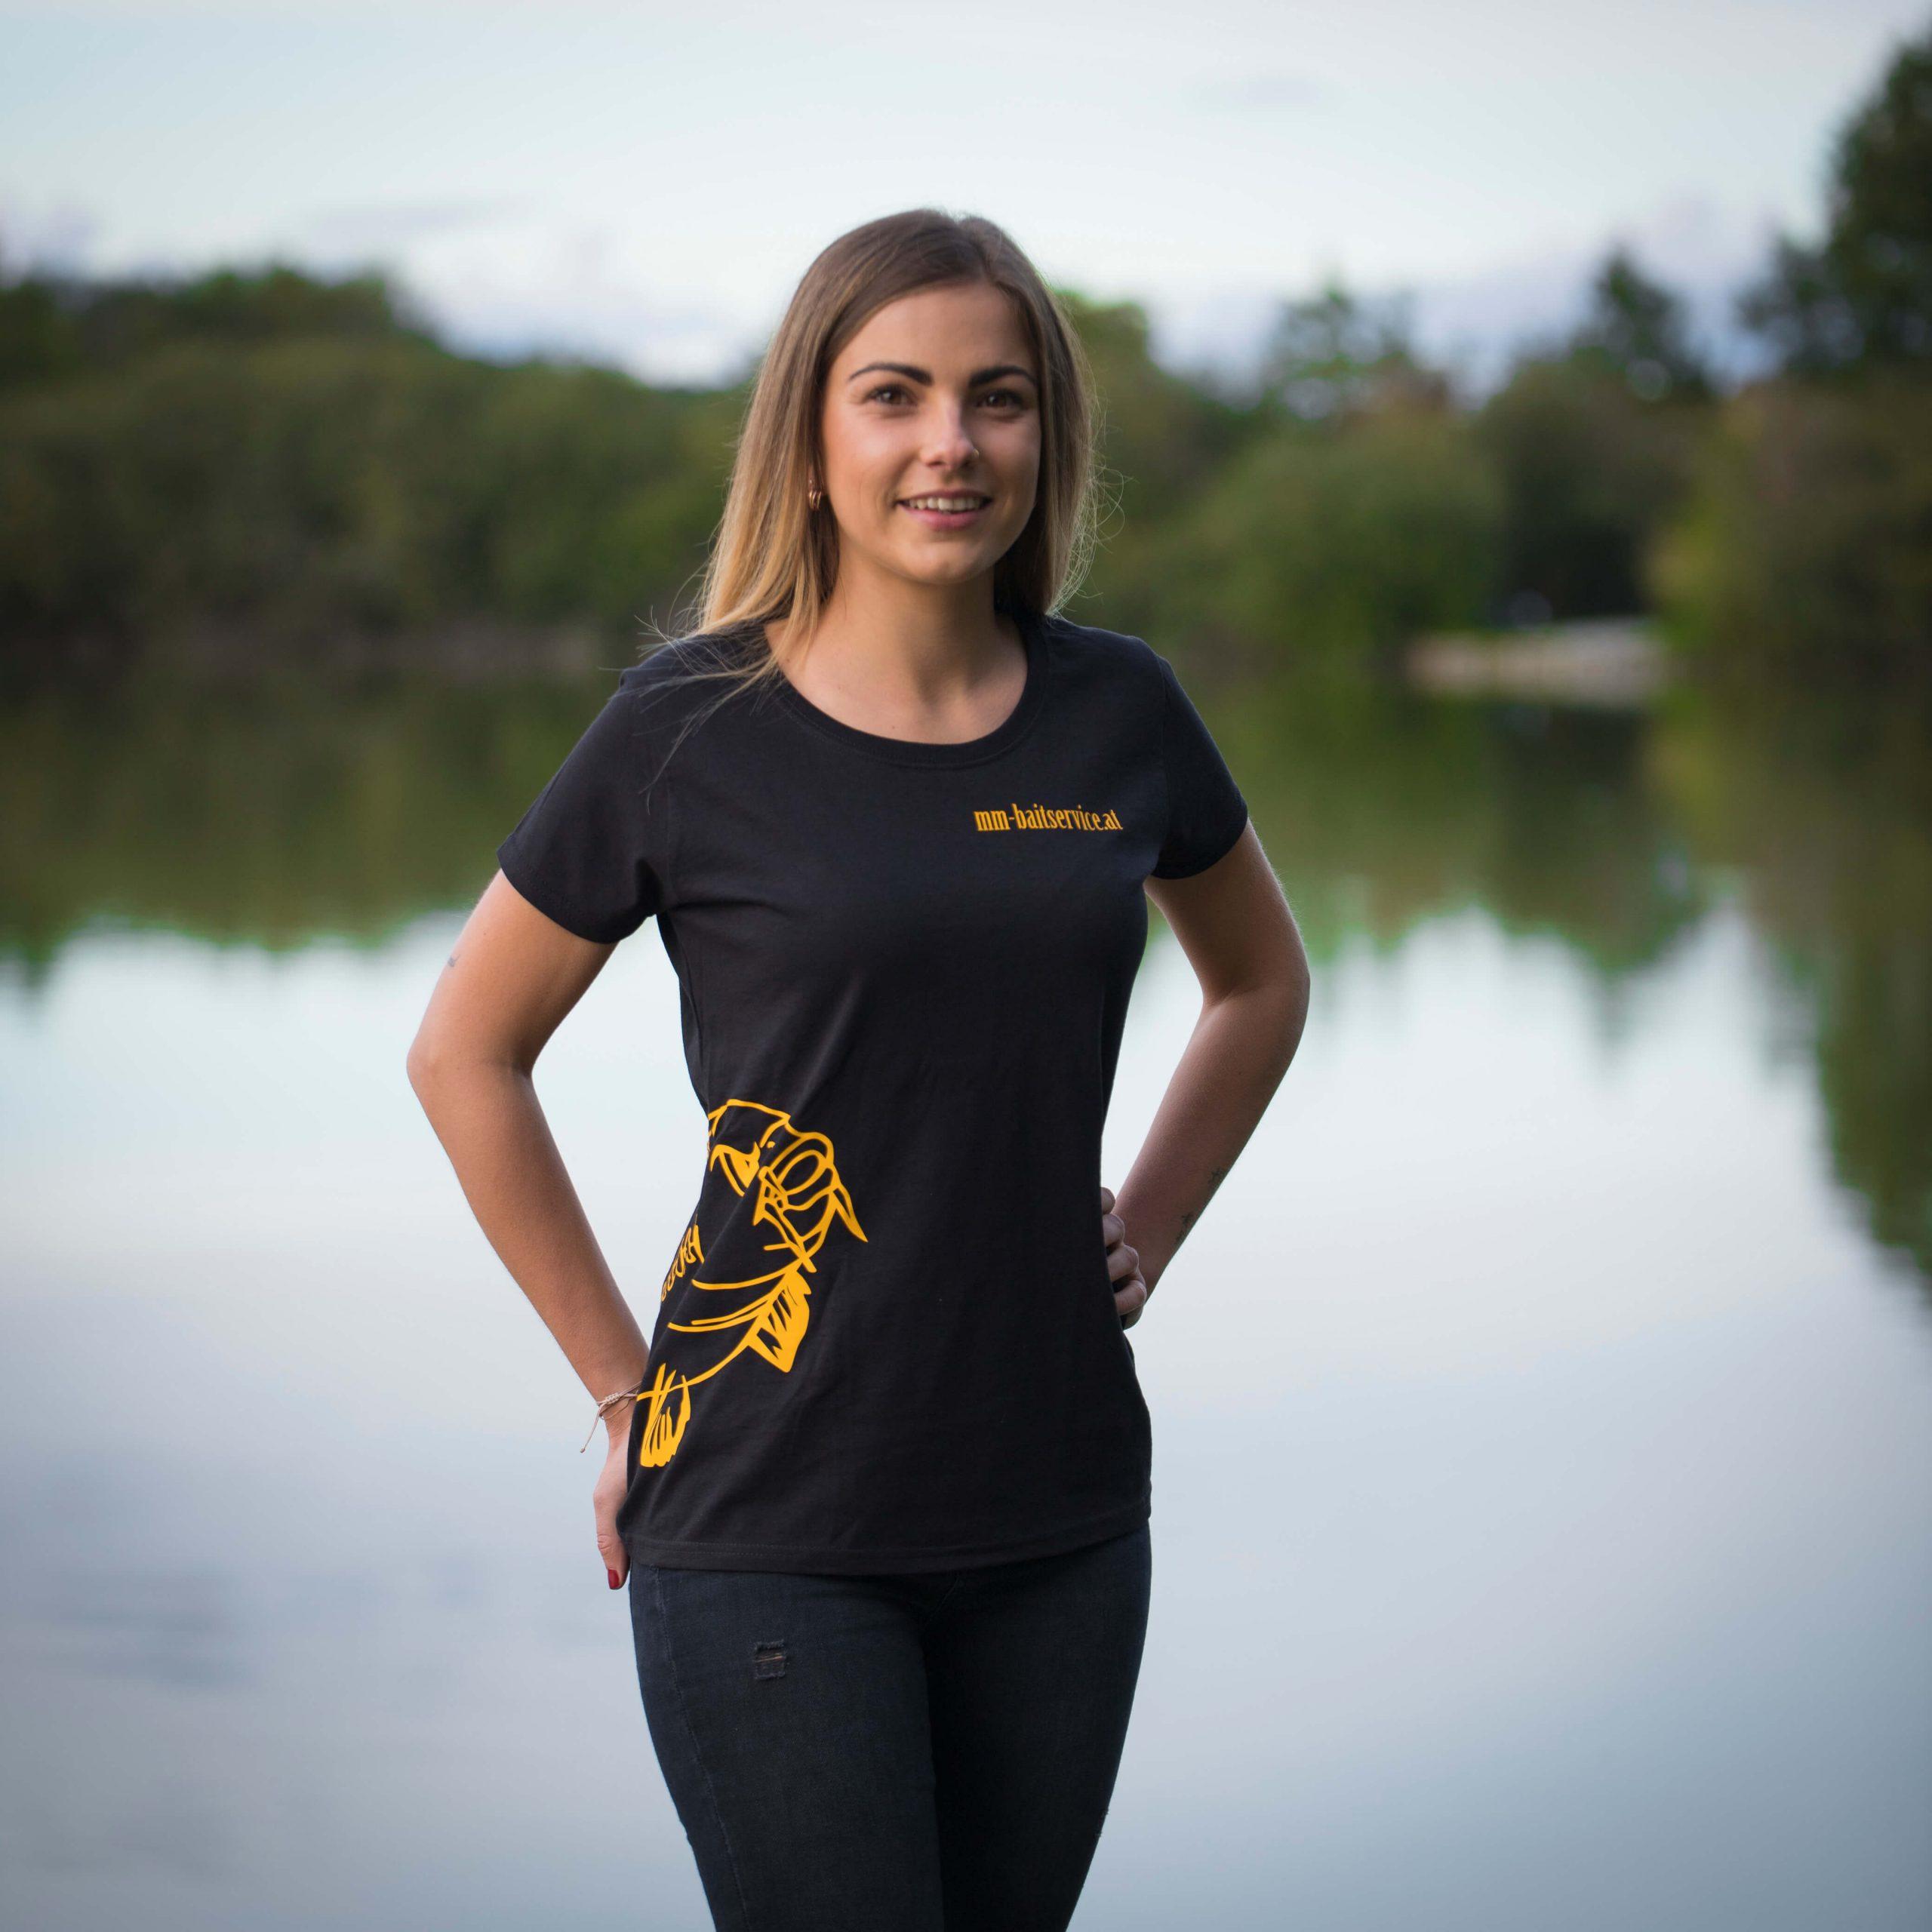 Damen T-shirt mit Flosse